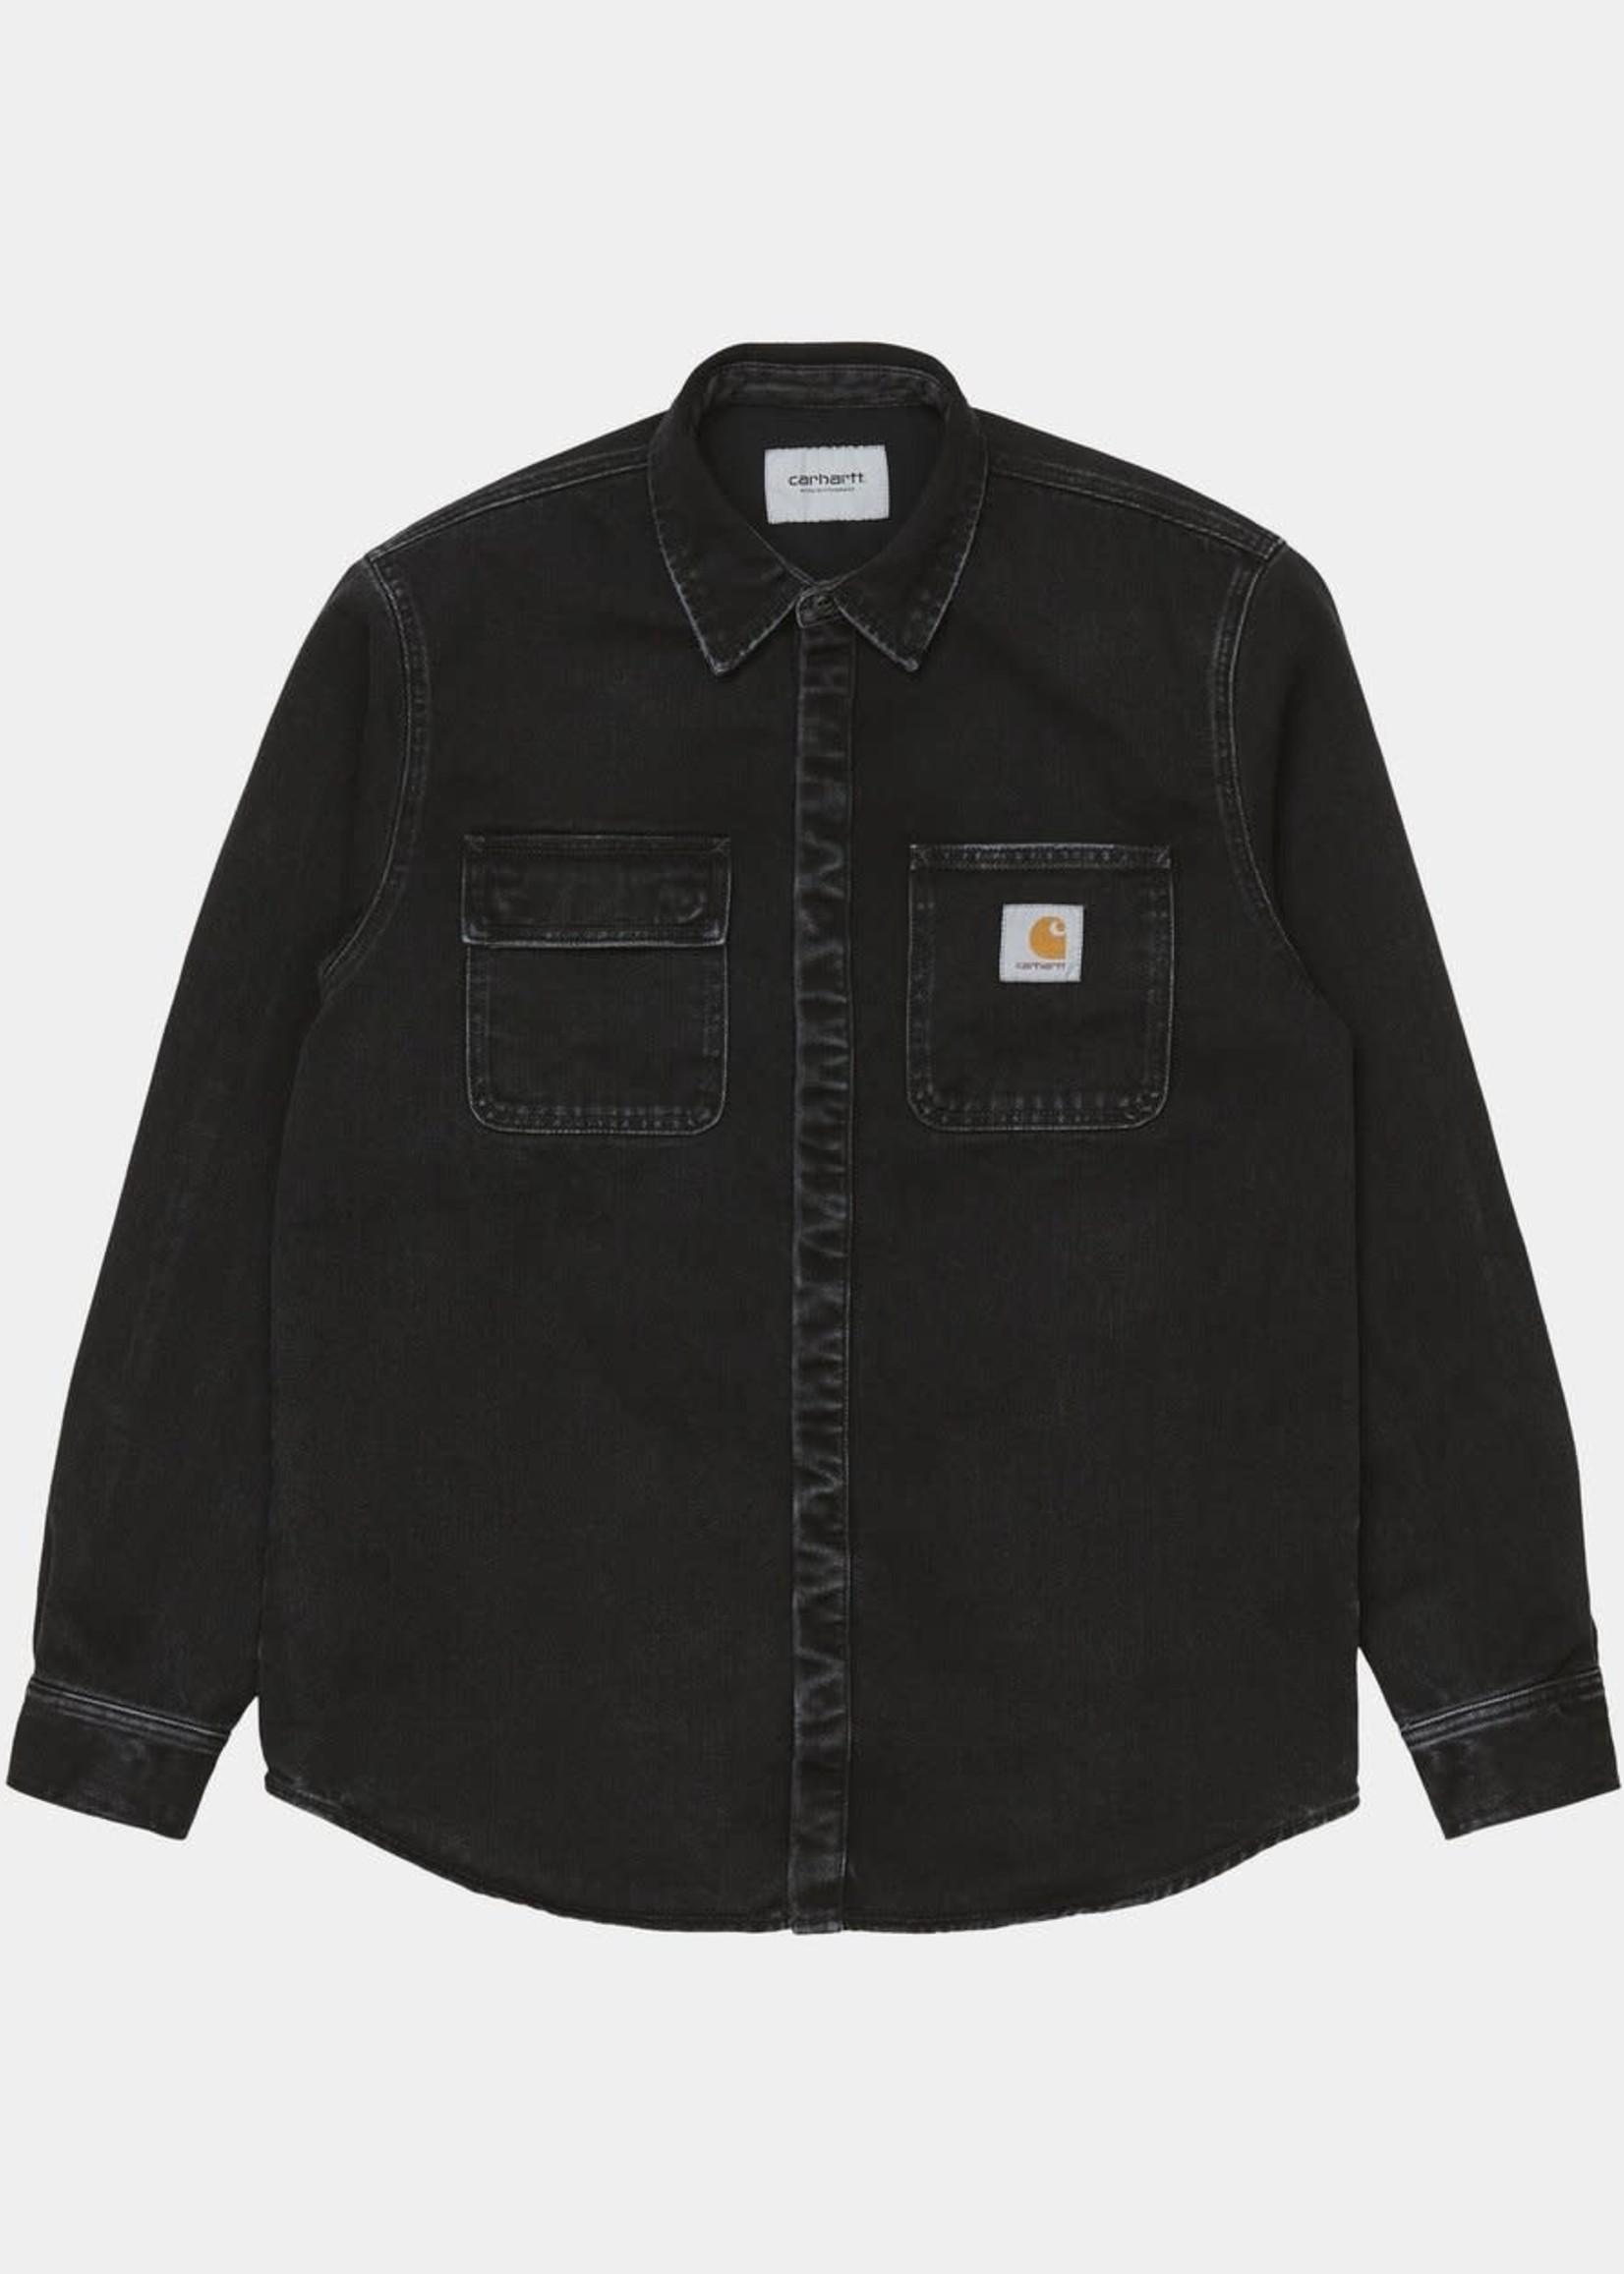 Carhartt Work In Progress Salinac Shirt Jacket in Black Stone Washed Denim